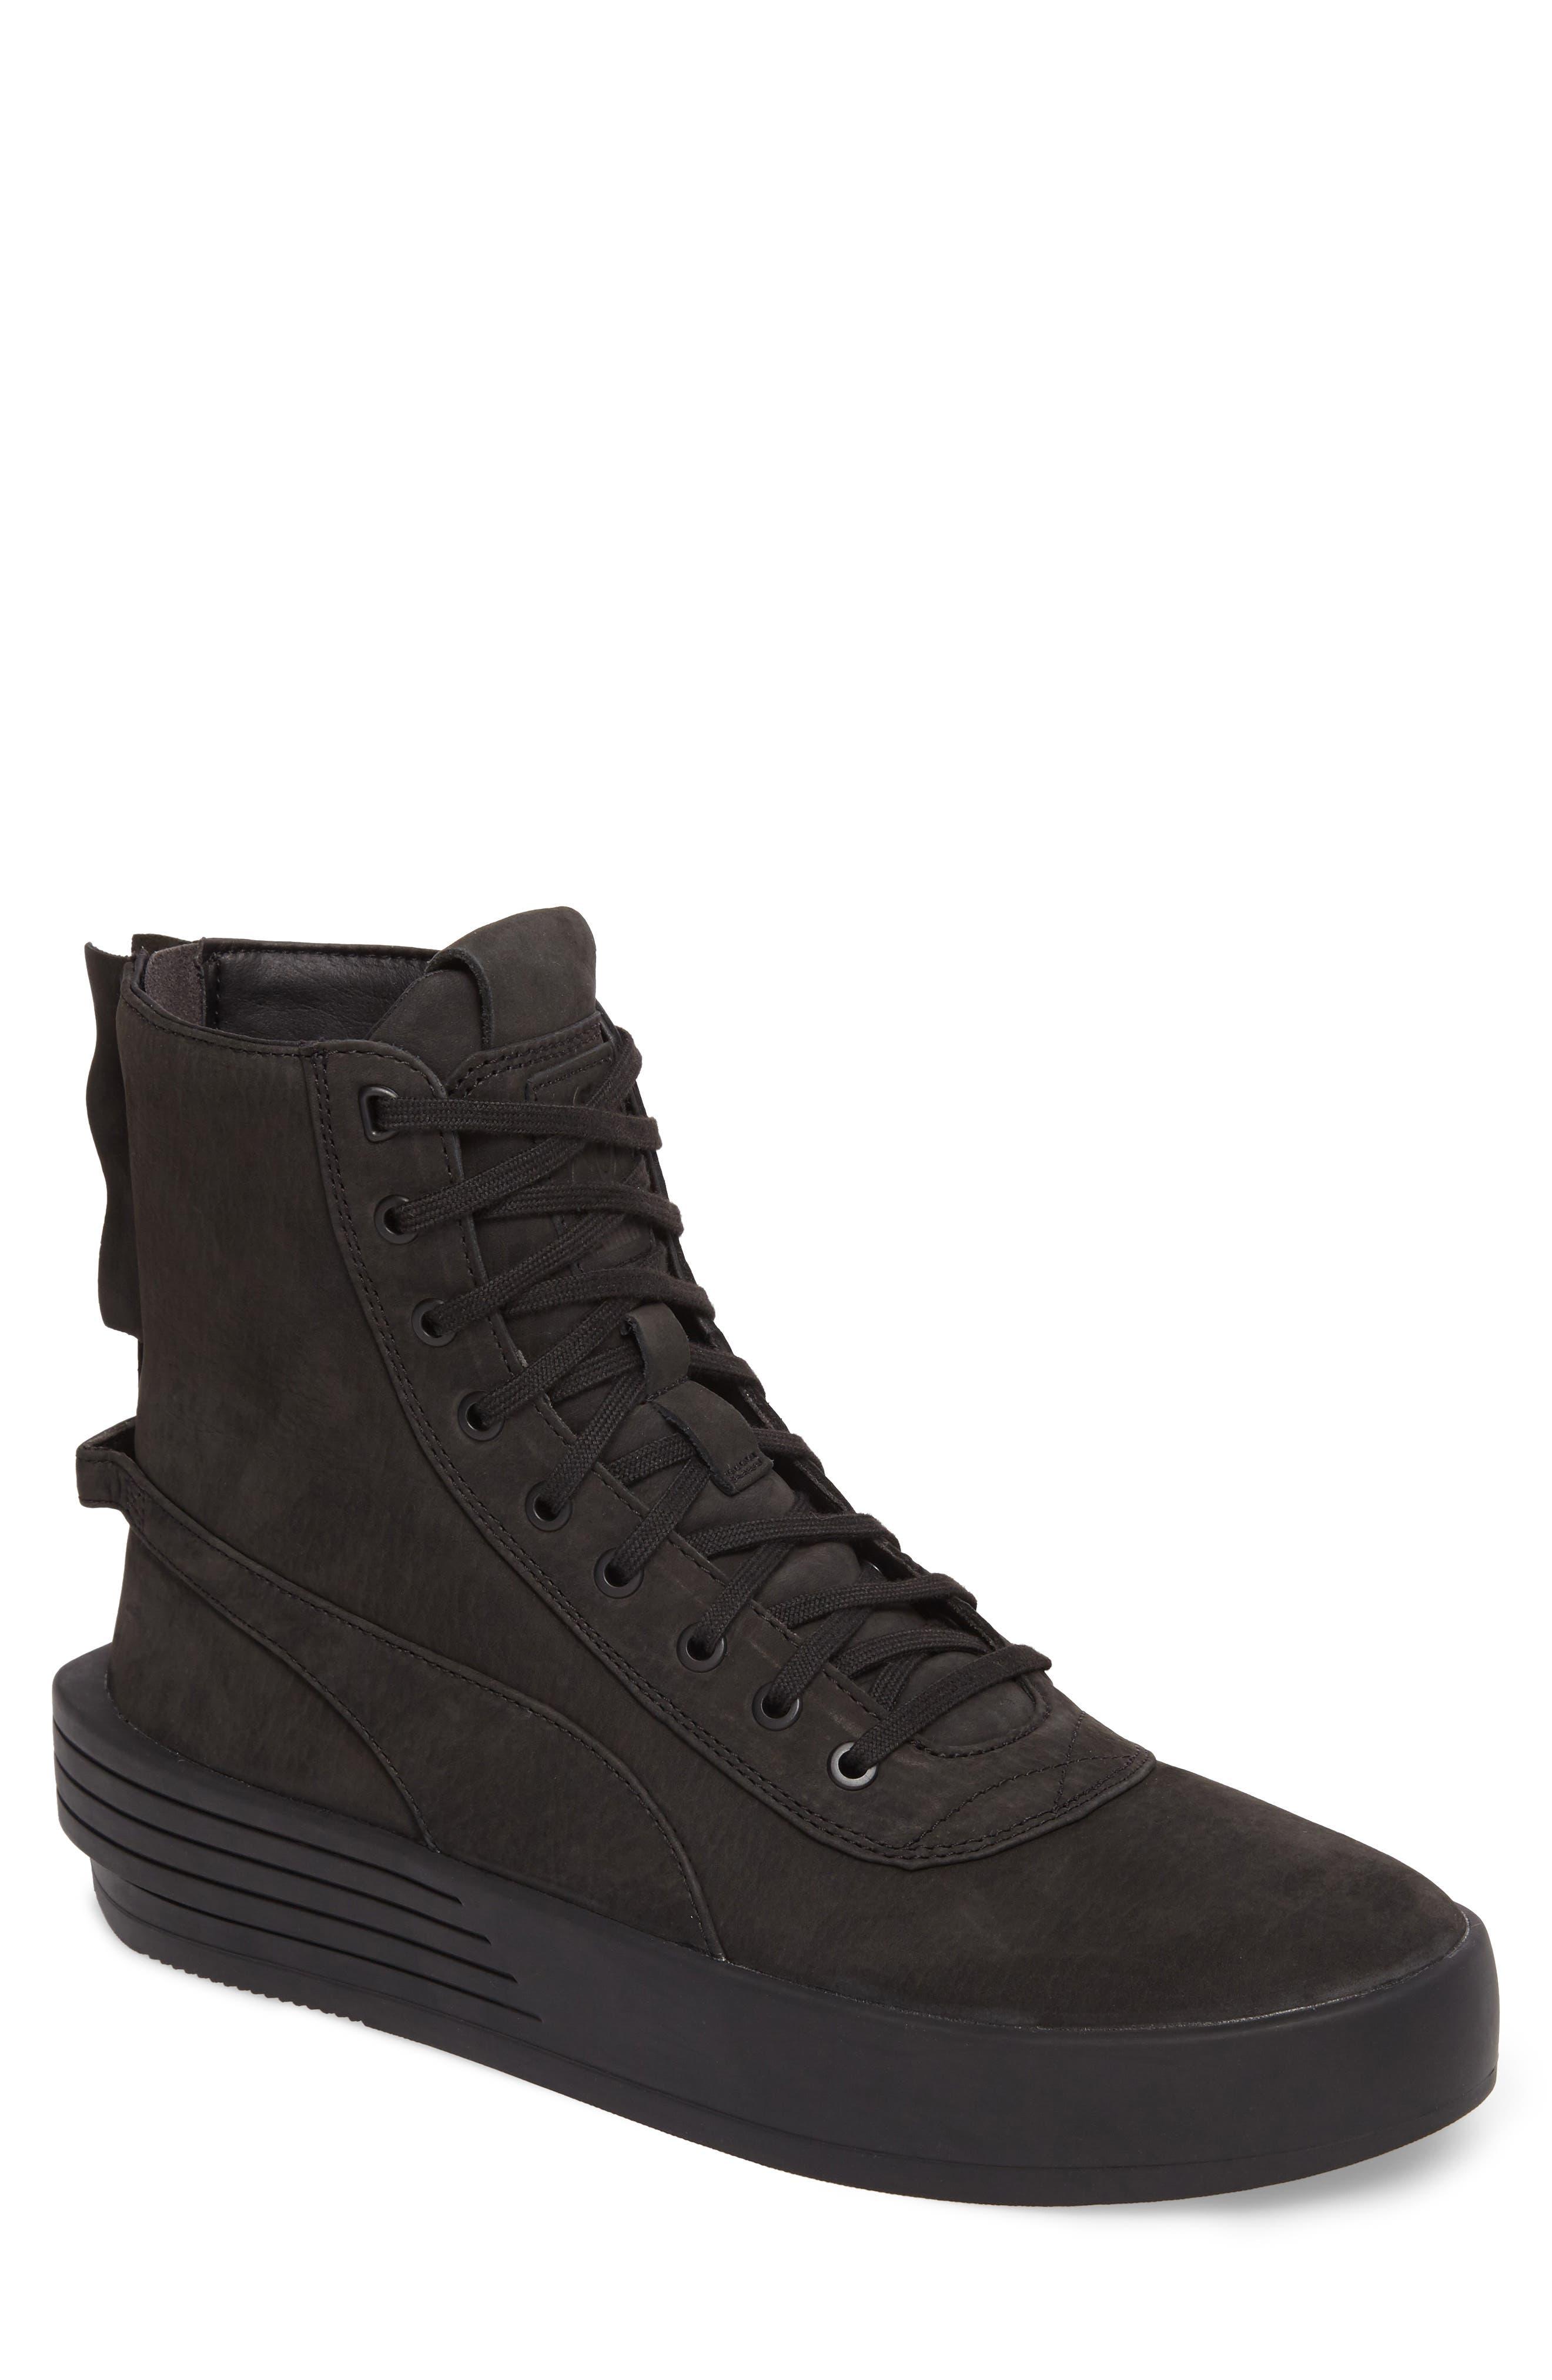 Alternate Image 1 Selected - PUMA XO Parallel Weeknd Sneaker (Men)